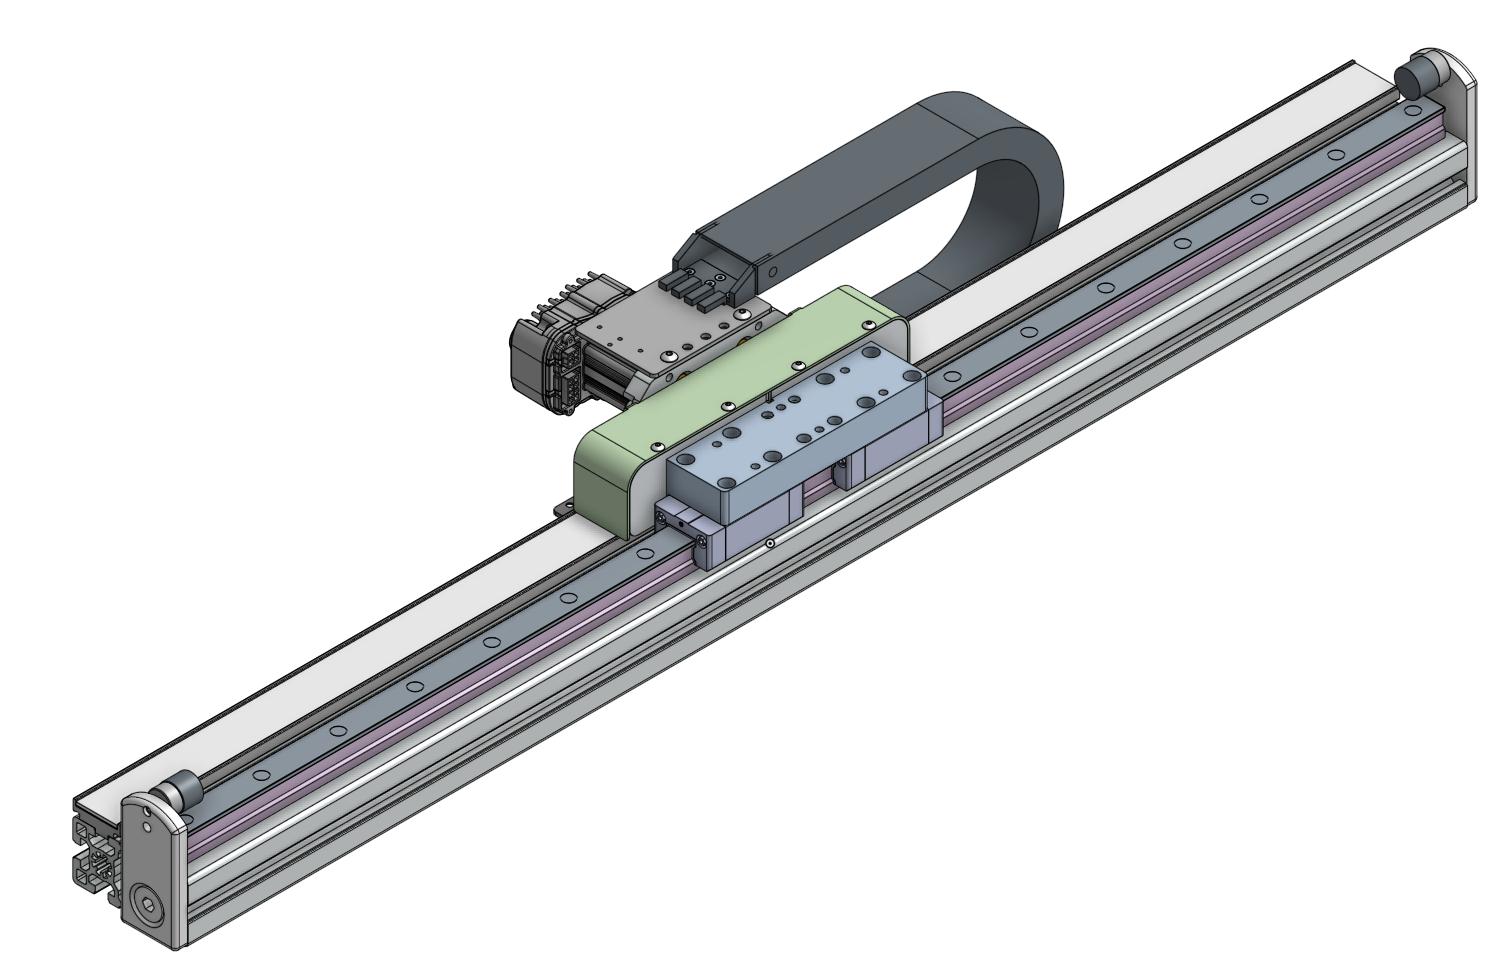 Bell-Everman Linear Travel CNC Heavy Duty